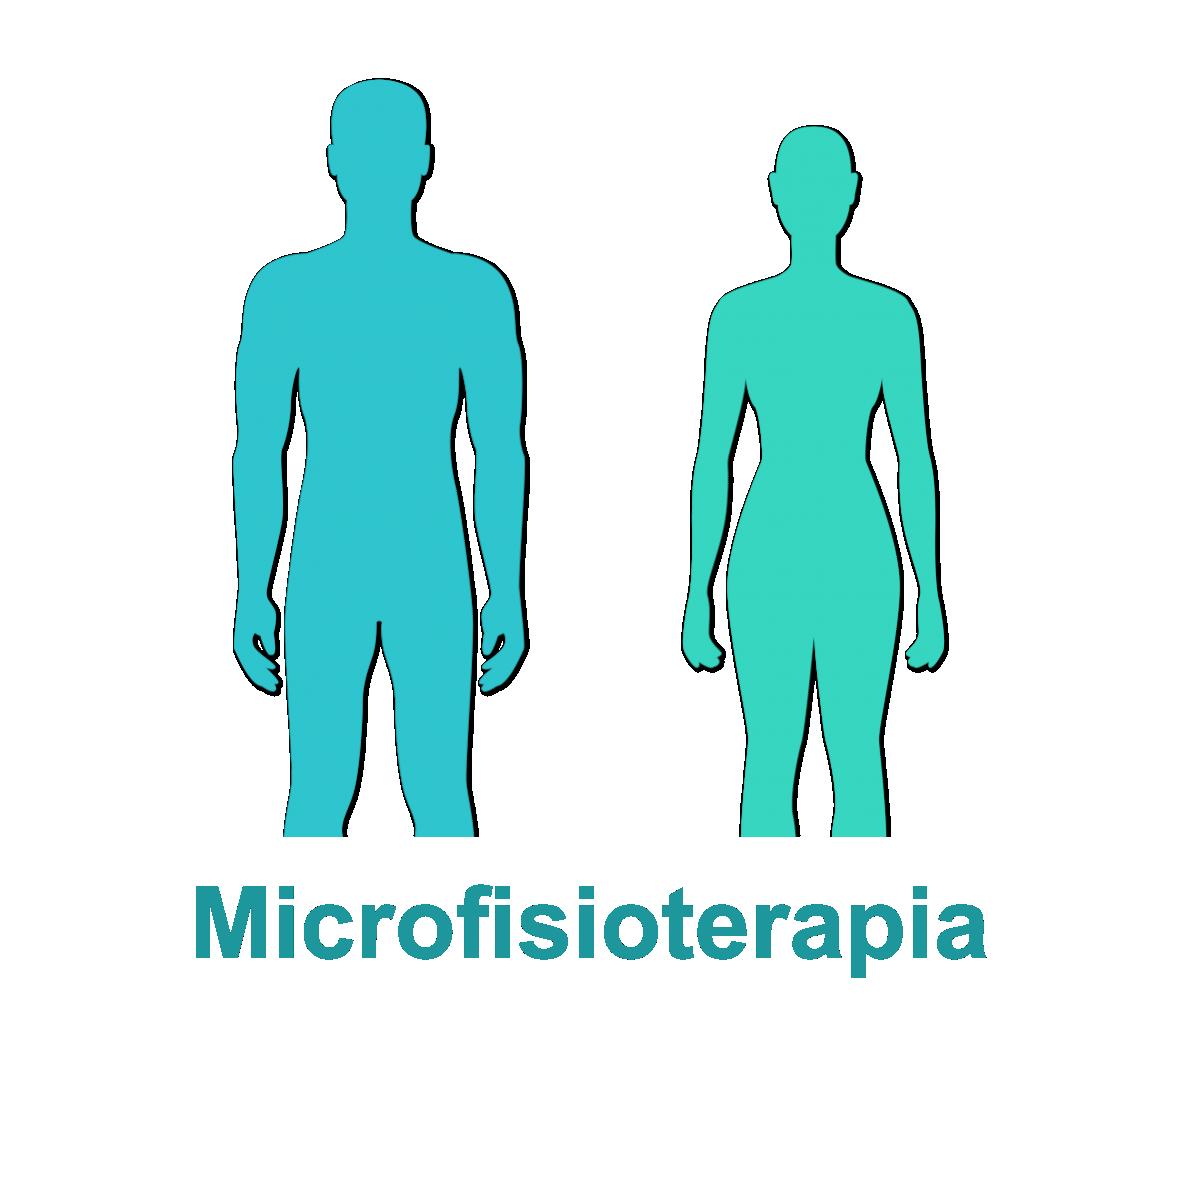 Microfisioterapia